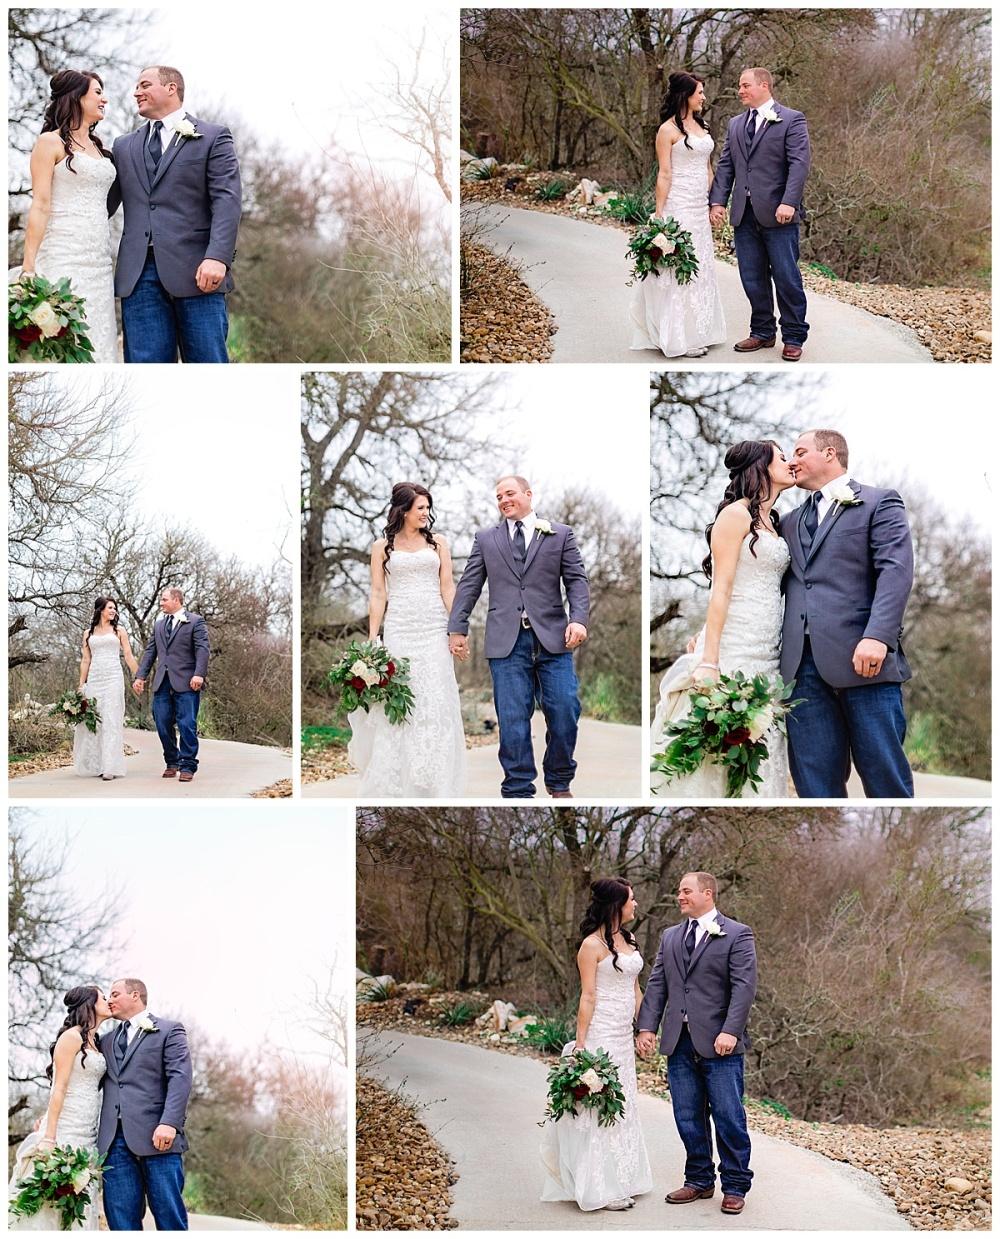 Carly-Barton-Photography-Geronimo-Oaks-Wedding-Venue-Texas-Hill-Country-Ronnie-Sarah_0069.jpg